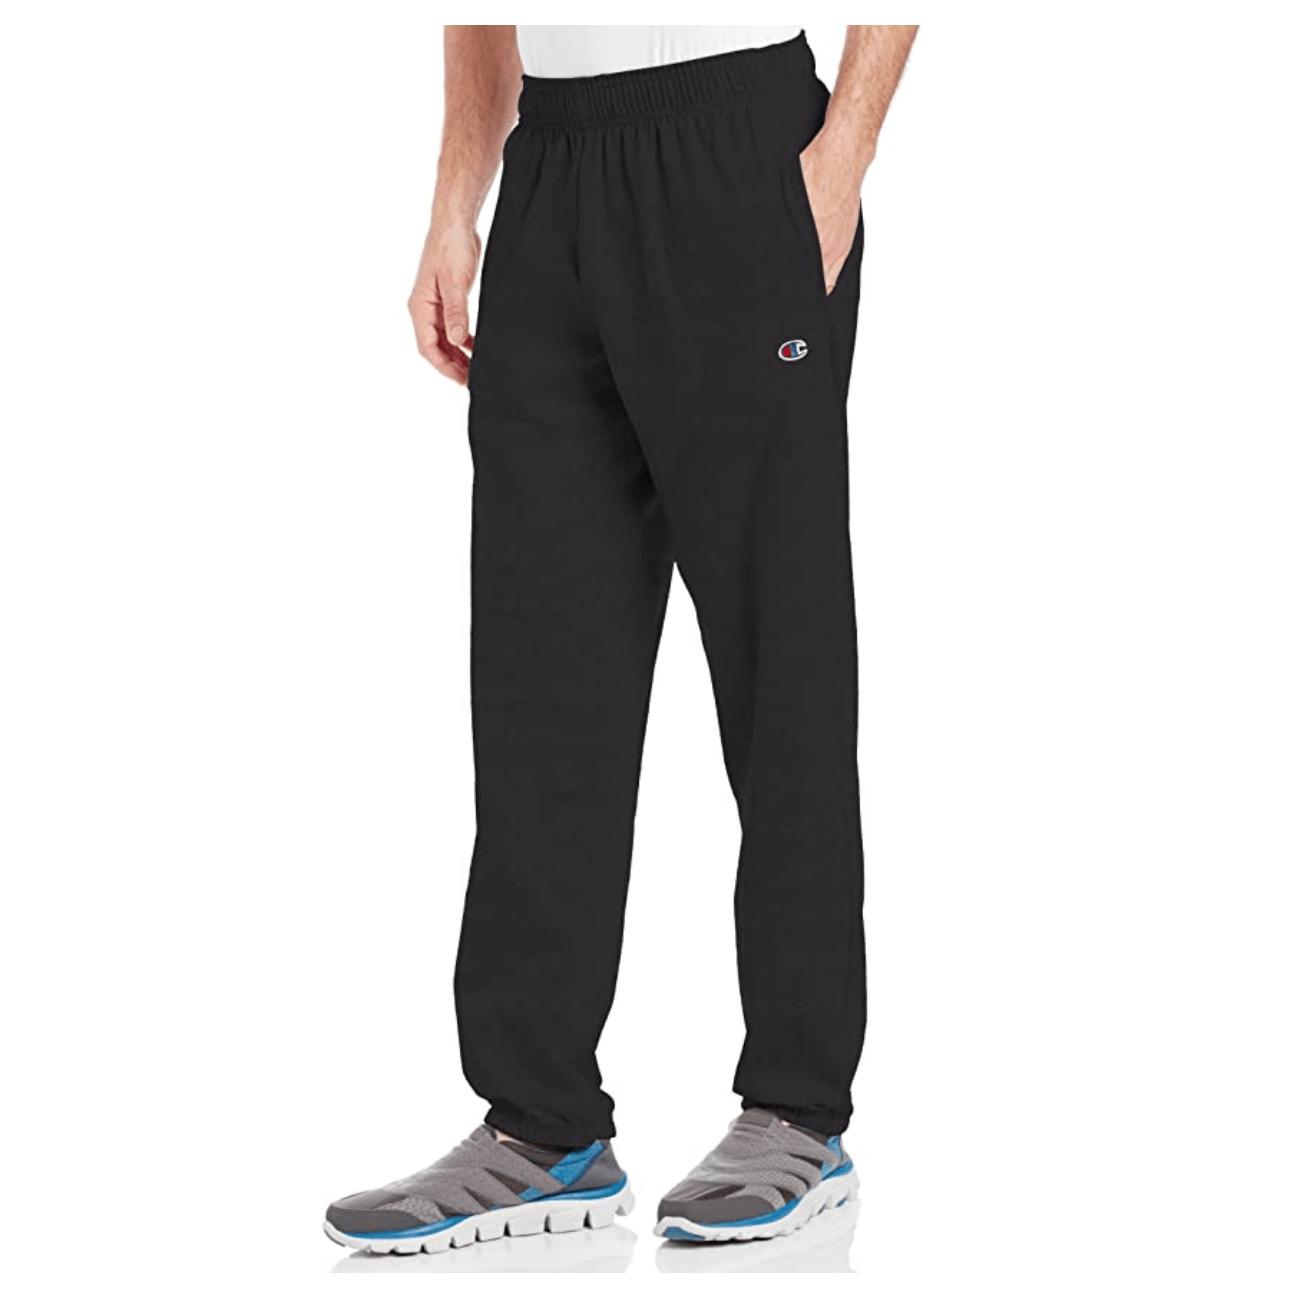 Men's Closed Bottom Sweatpant